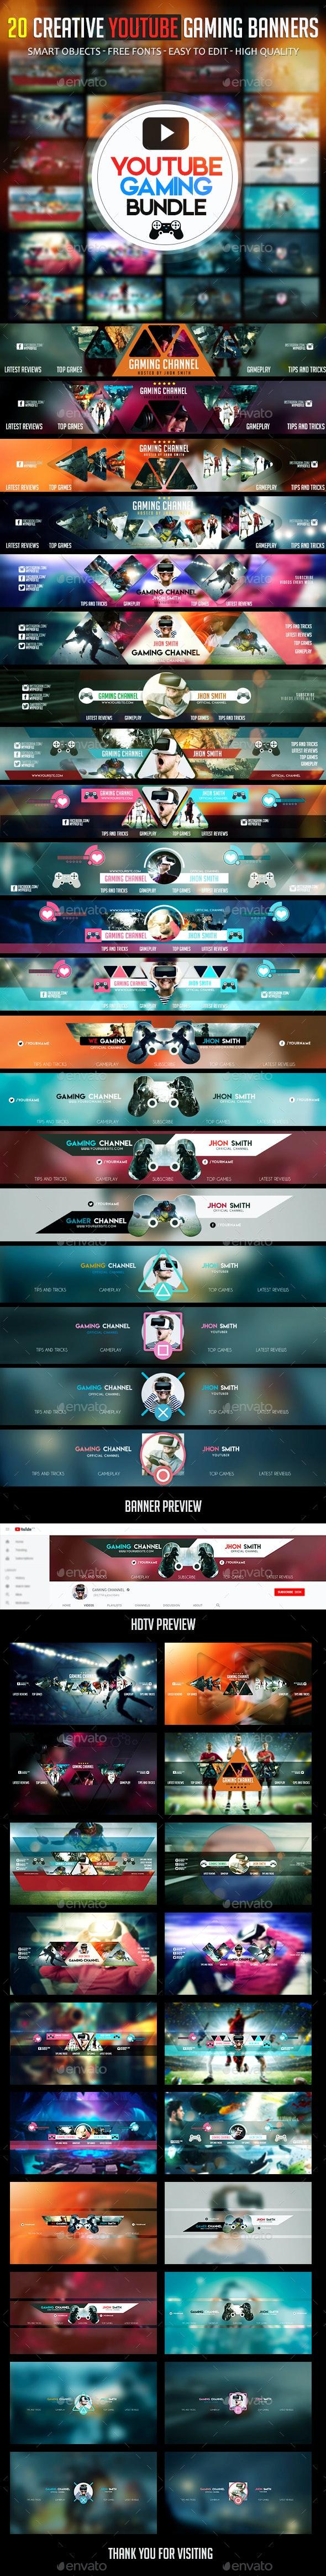 Gaming Bundle - 20 YouTube Gaming Banners - YouTube Social Media